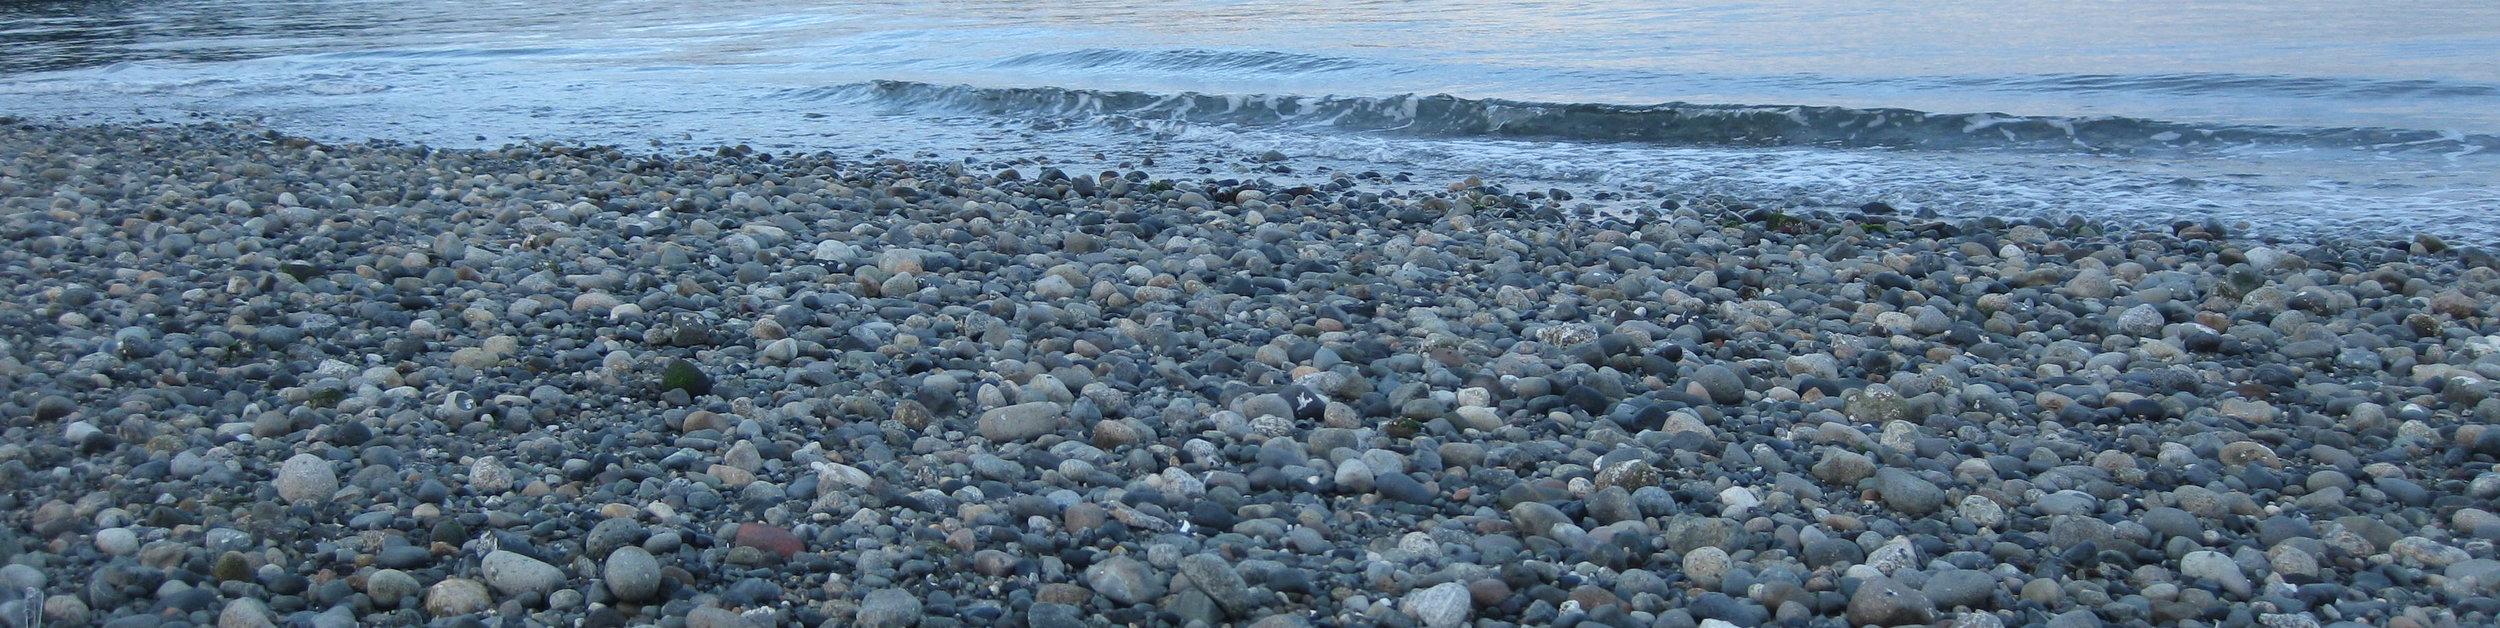 Puget Sound beach, Washington